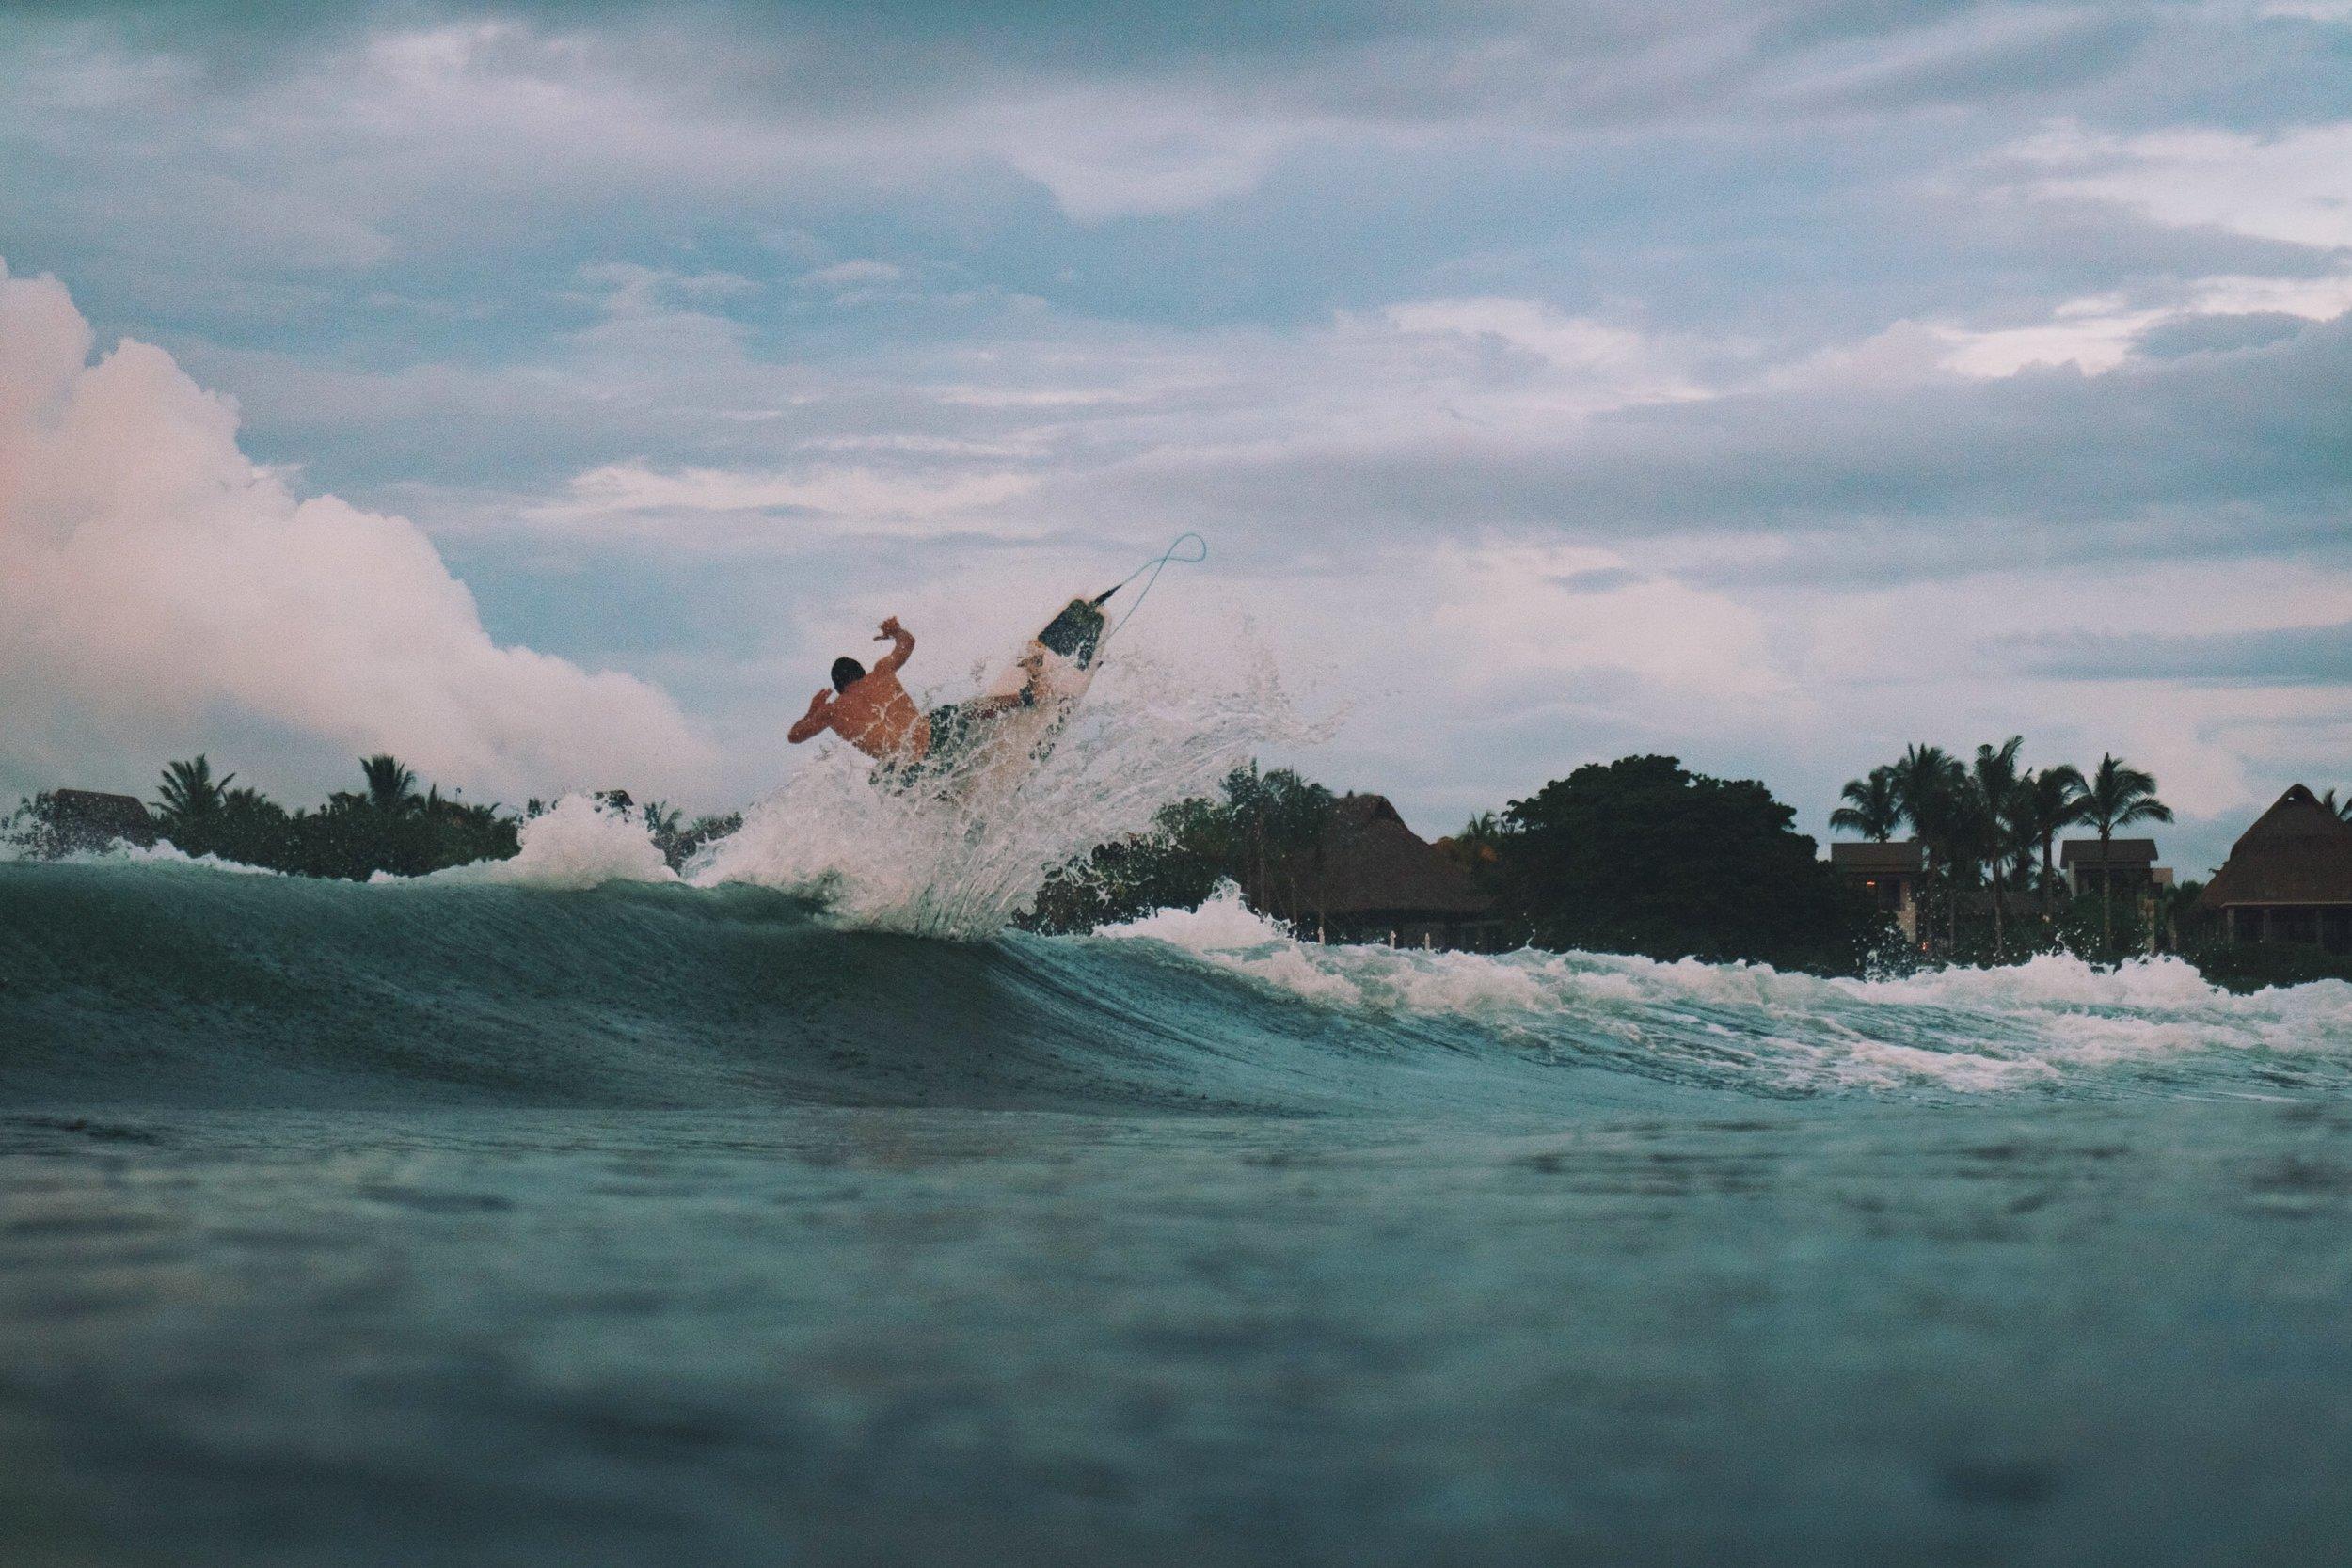 Tristan-Guibald-Surf-México-Sayulita-Pascuales-Zihuatanejo-Fotografía-Heiko-Bothe-12.JPG